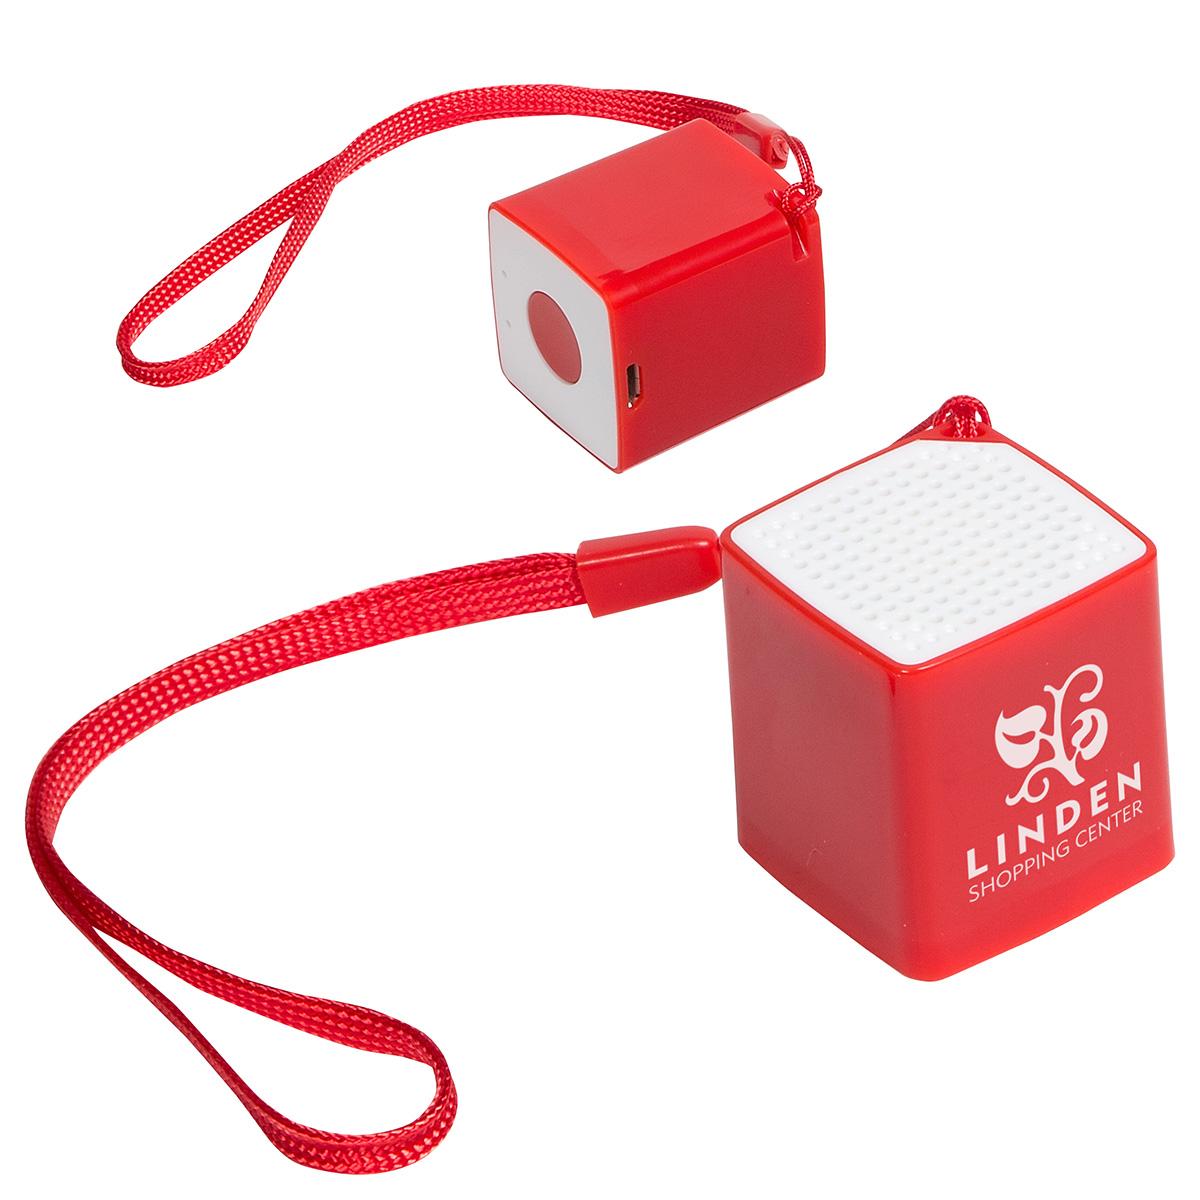 Wireless Mini Cube Speaker with Selfie Button & Mic, ESP-MC16, 1 Colour Imprint